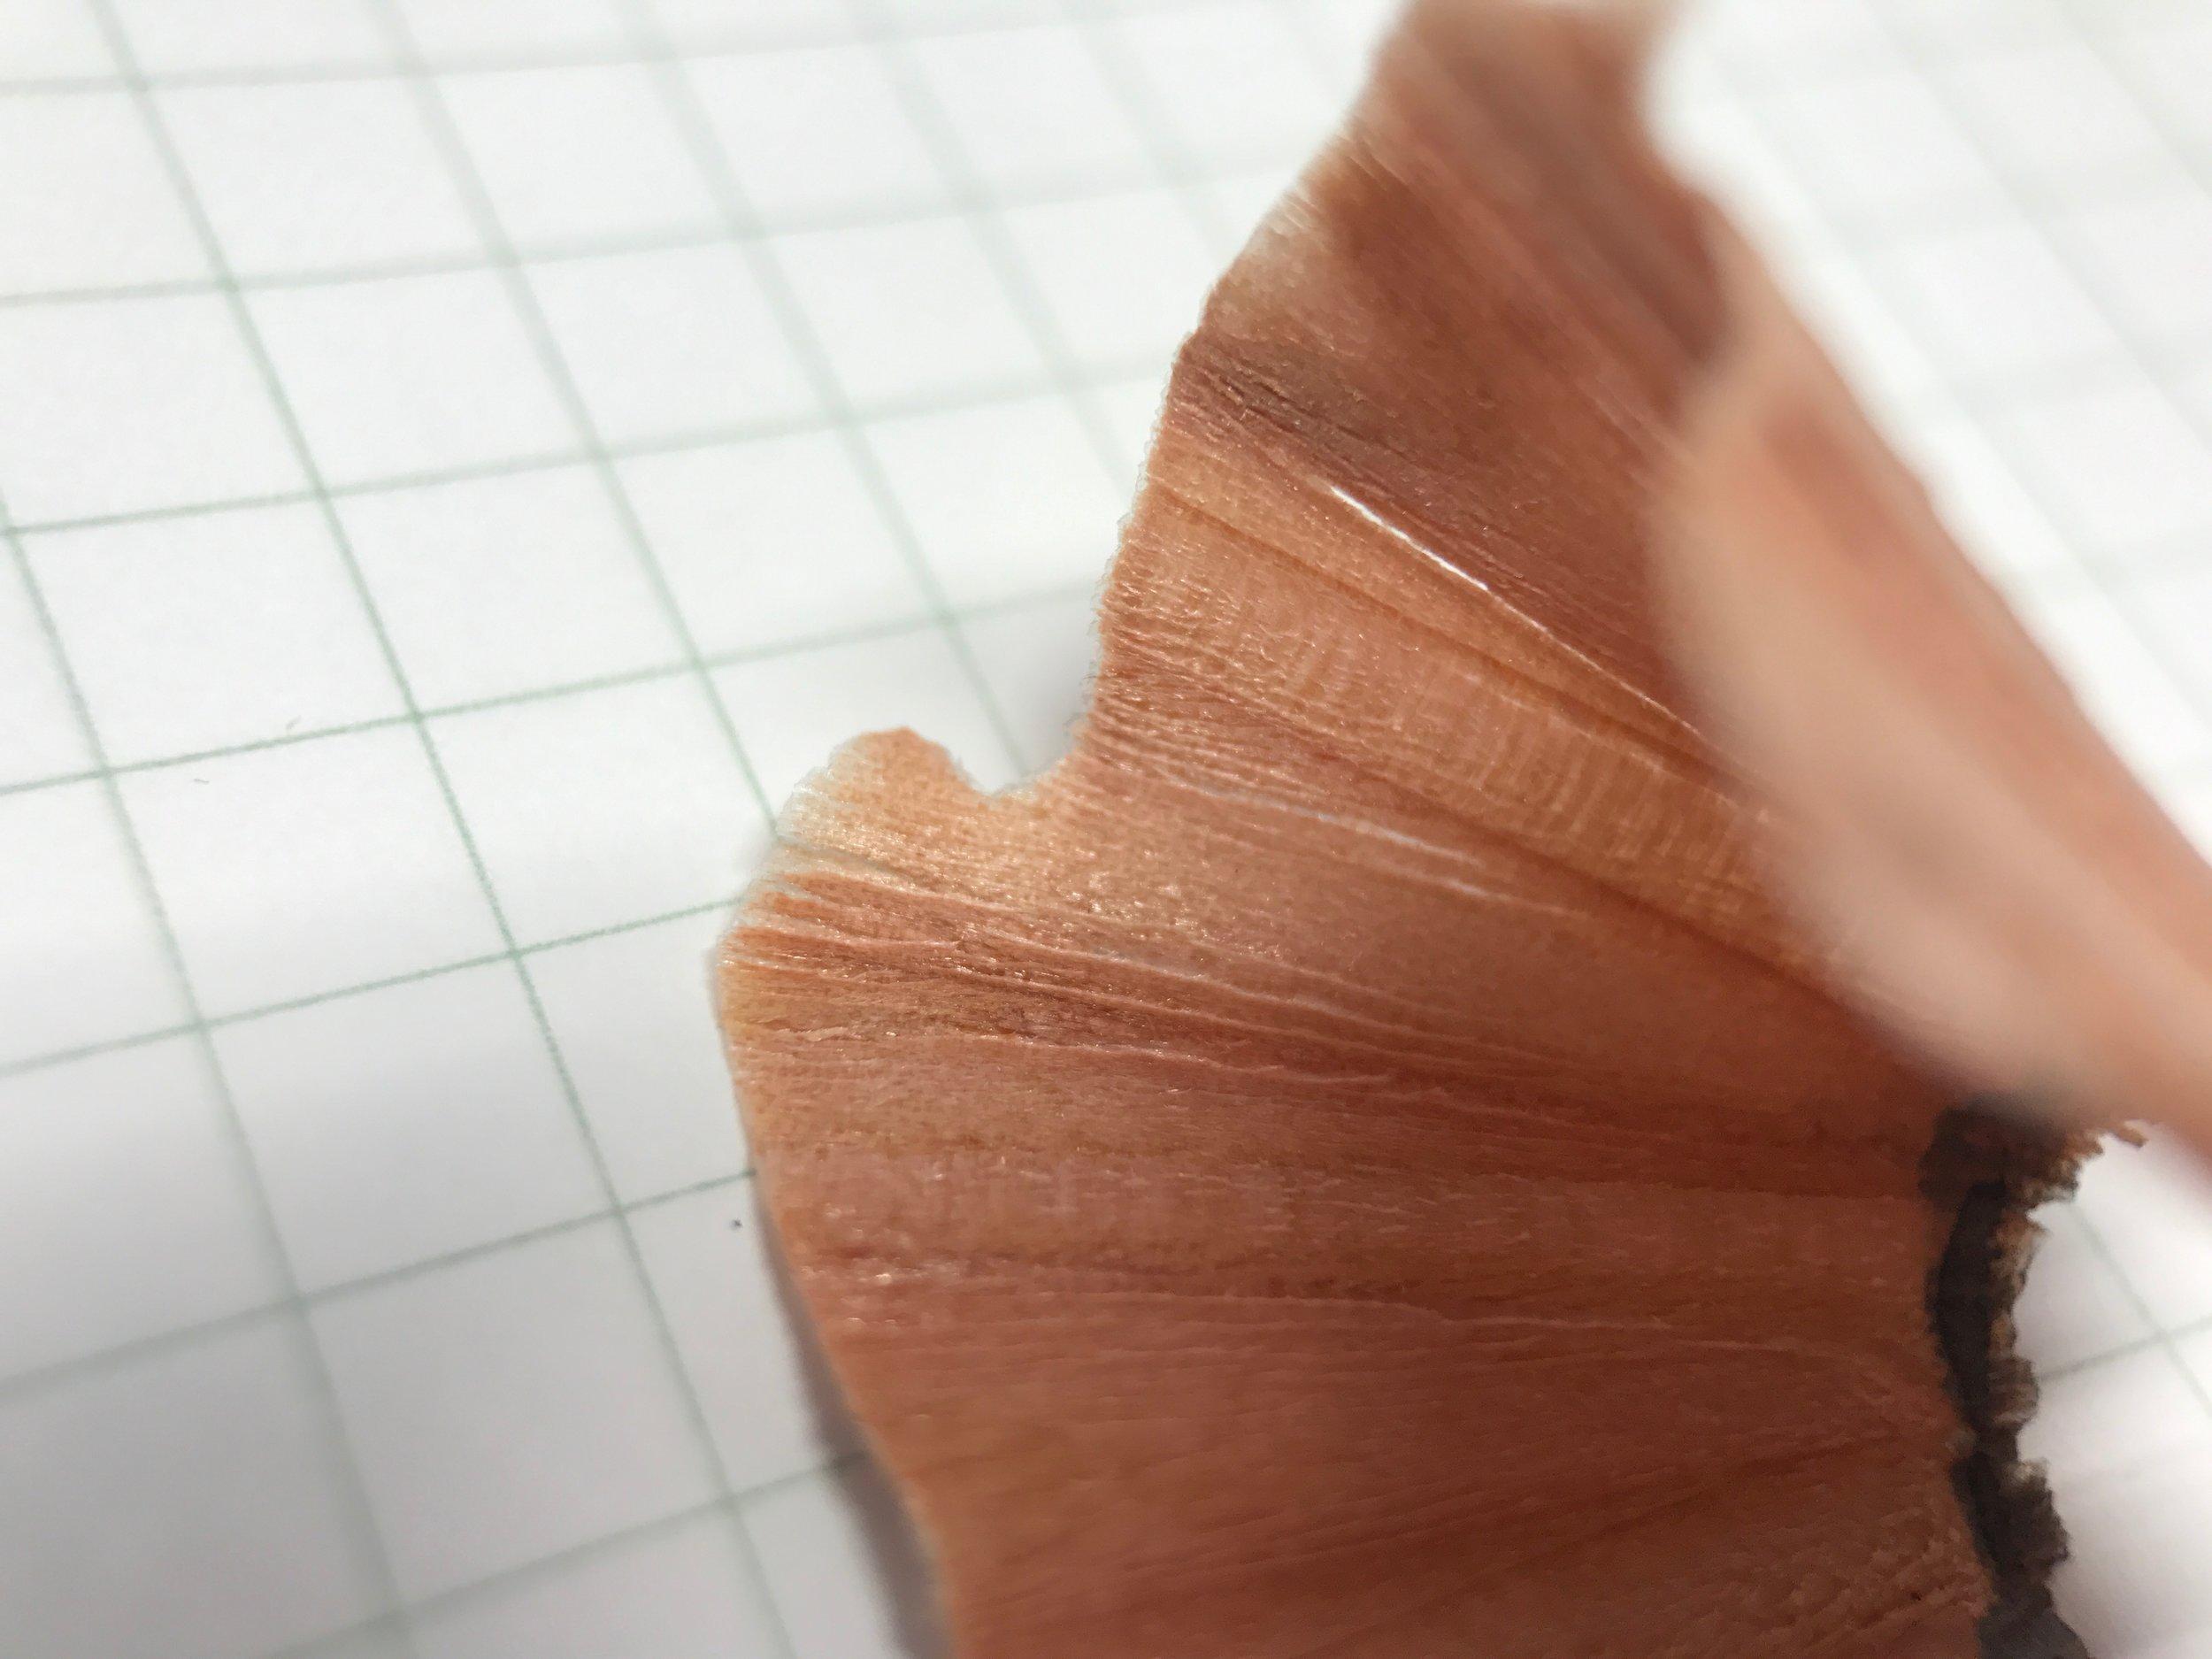 kirin-woody-pal-eddy-pencil-9.jpg